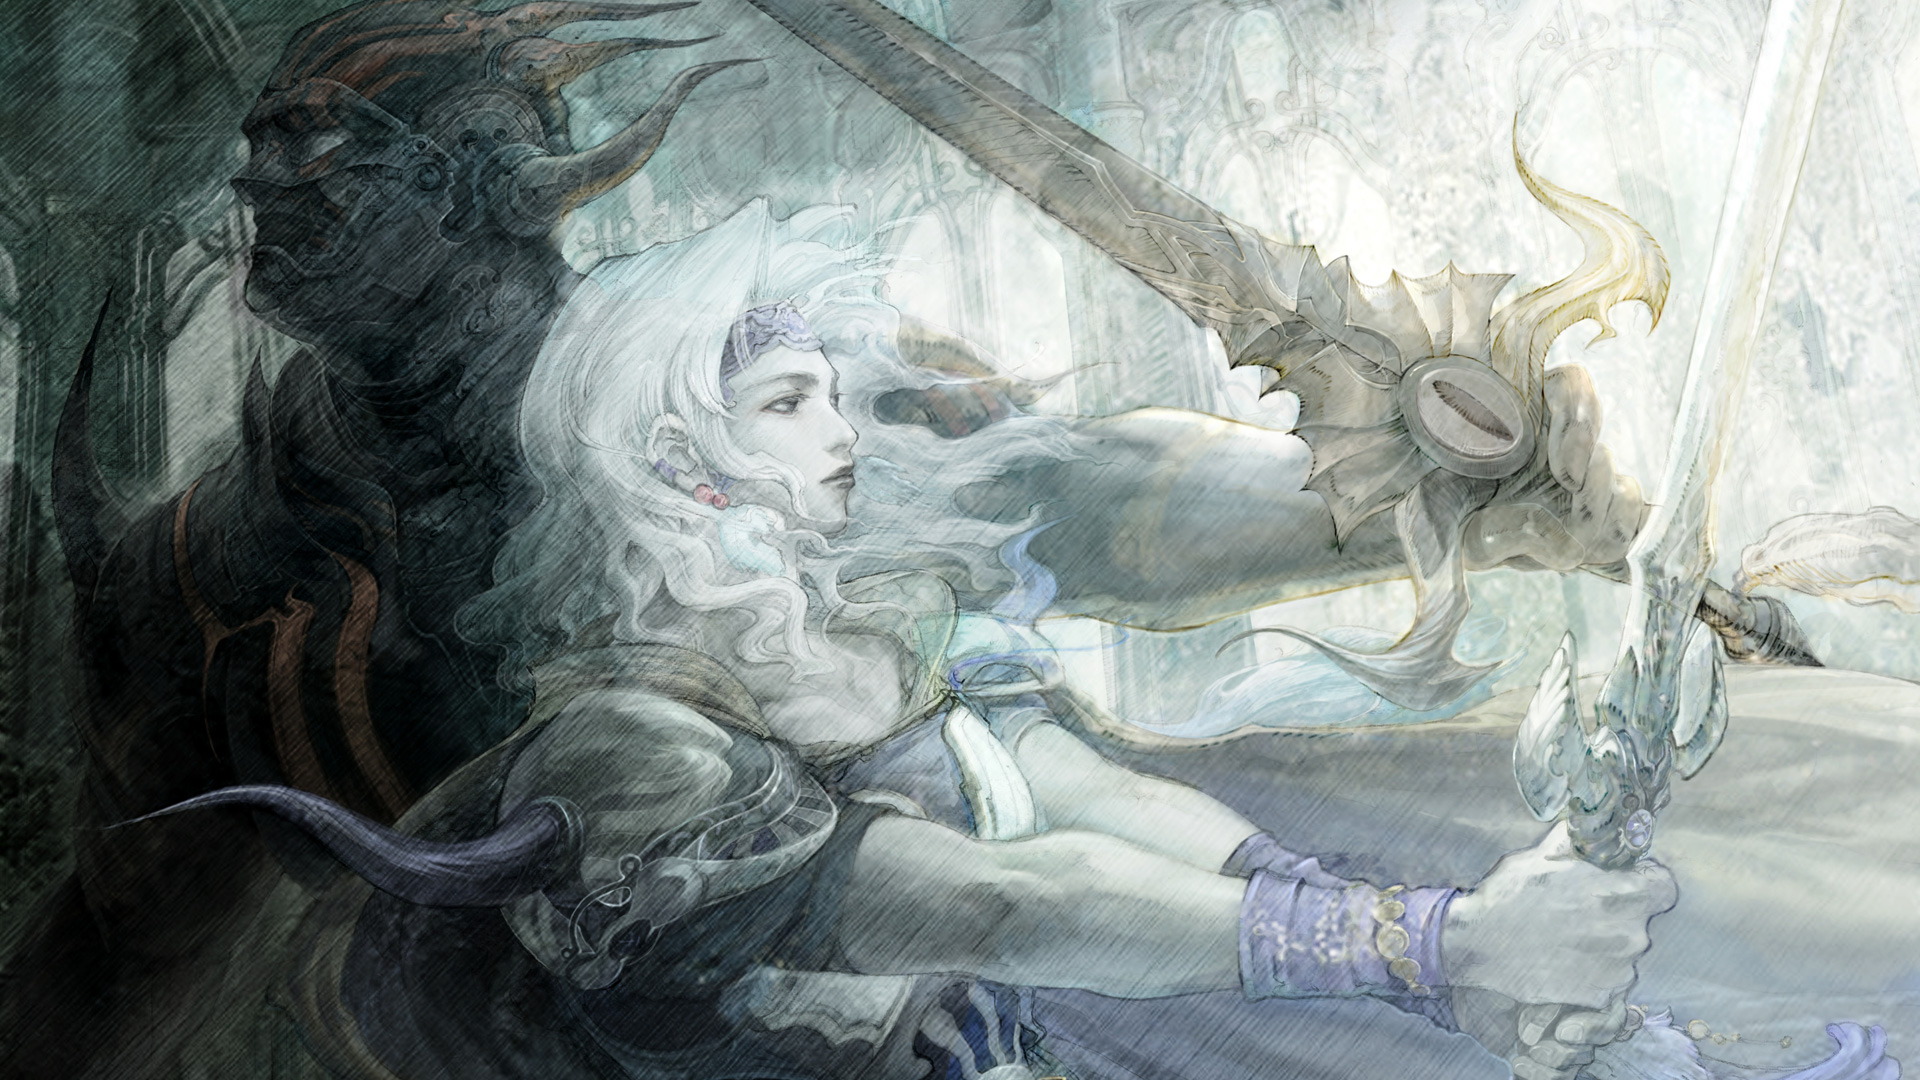 Free Final Fantasy IV Wallpaper in 1920x1080